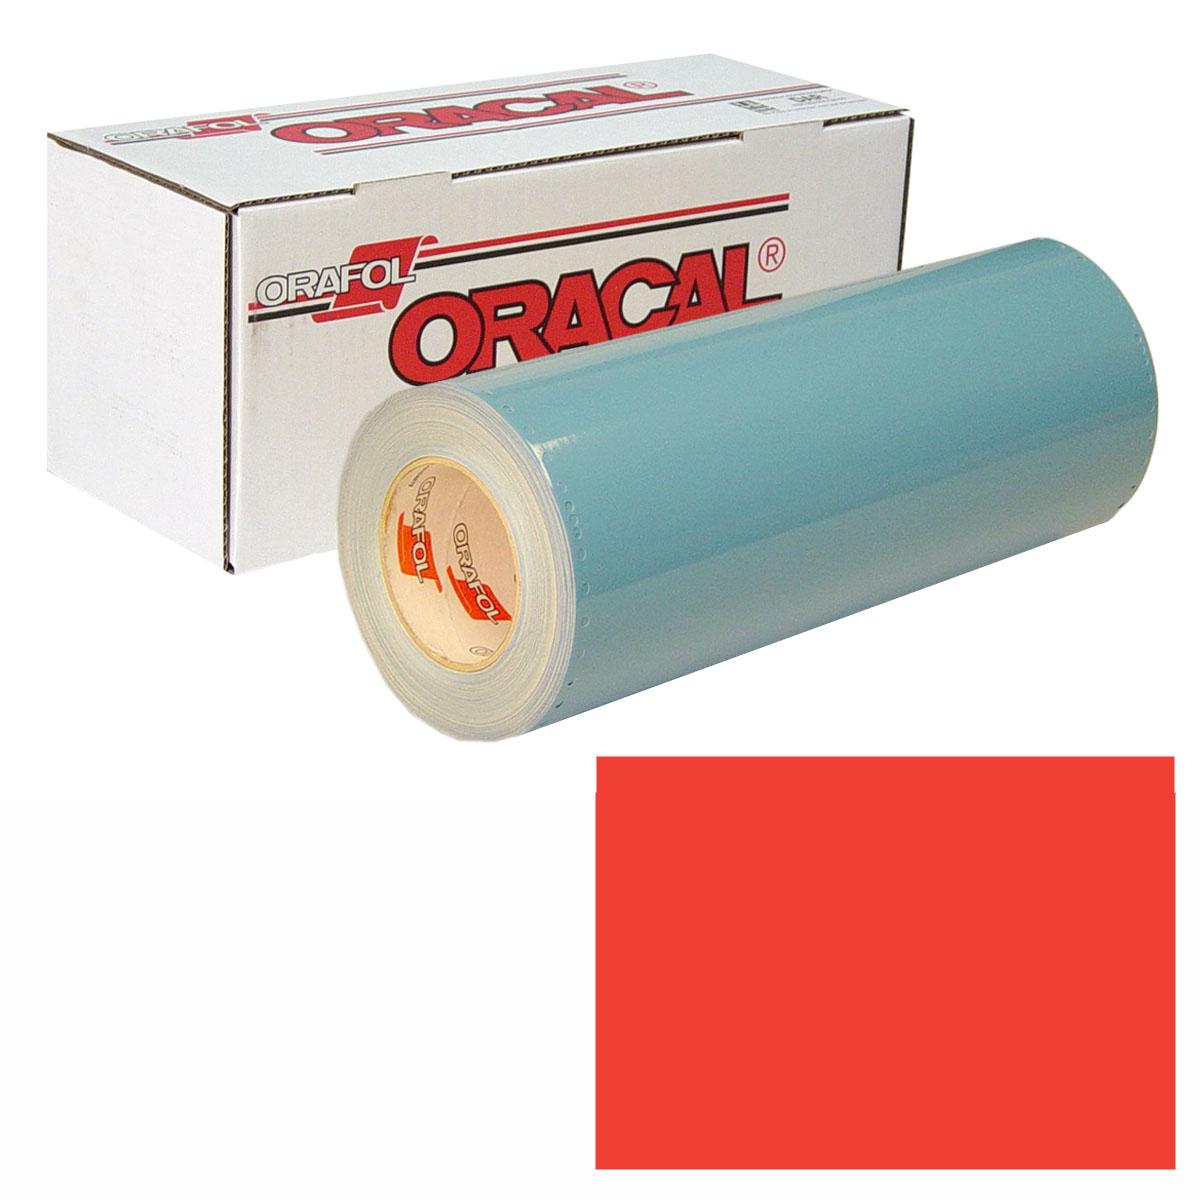 Buy Oracal 951 Unp 48in X 50yd 326 Signal Red